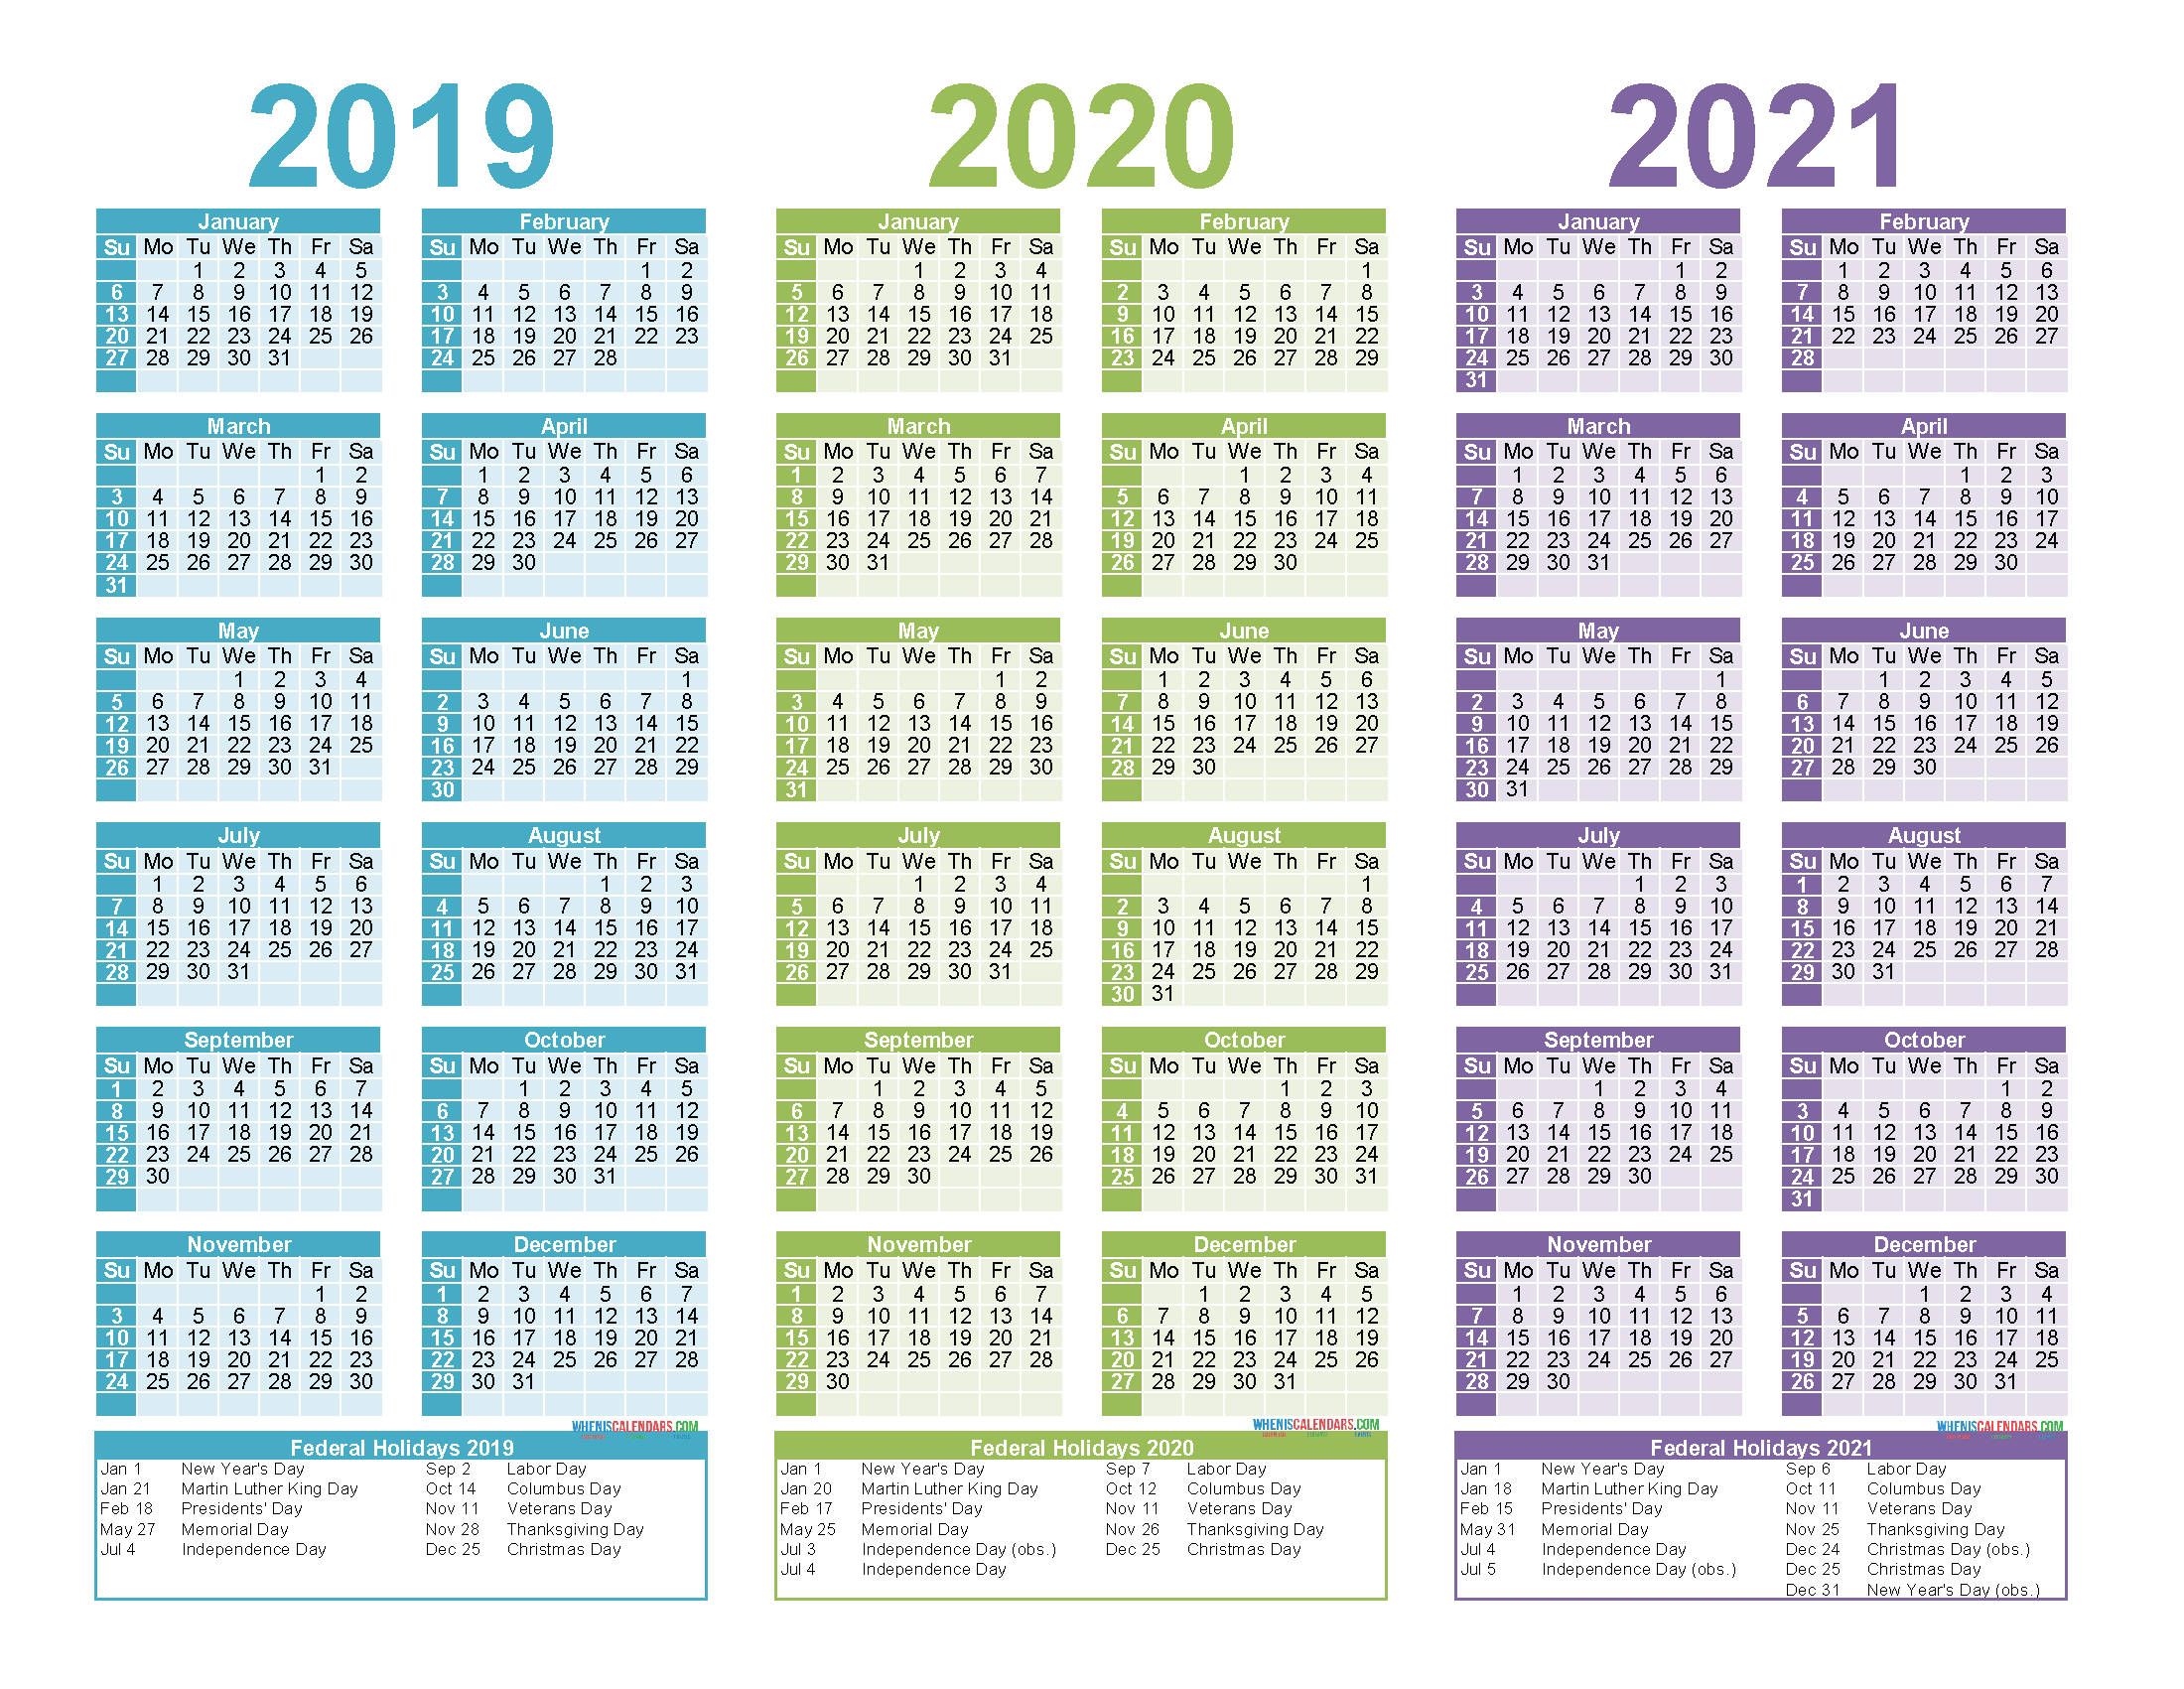 Free Printable 2019 2020 2021 Calendar With Holidays 2